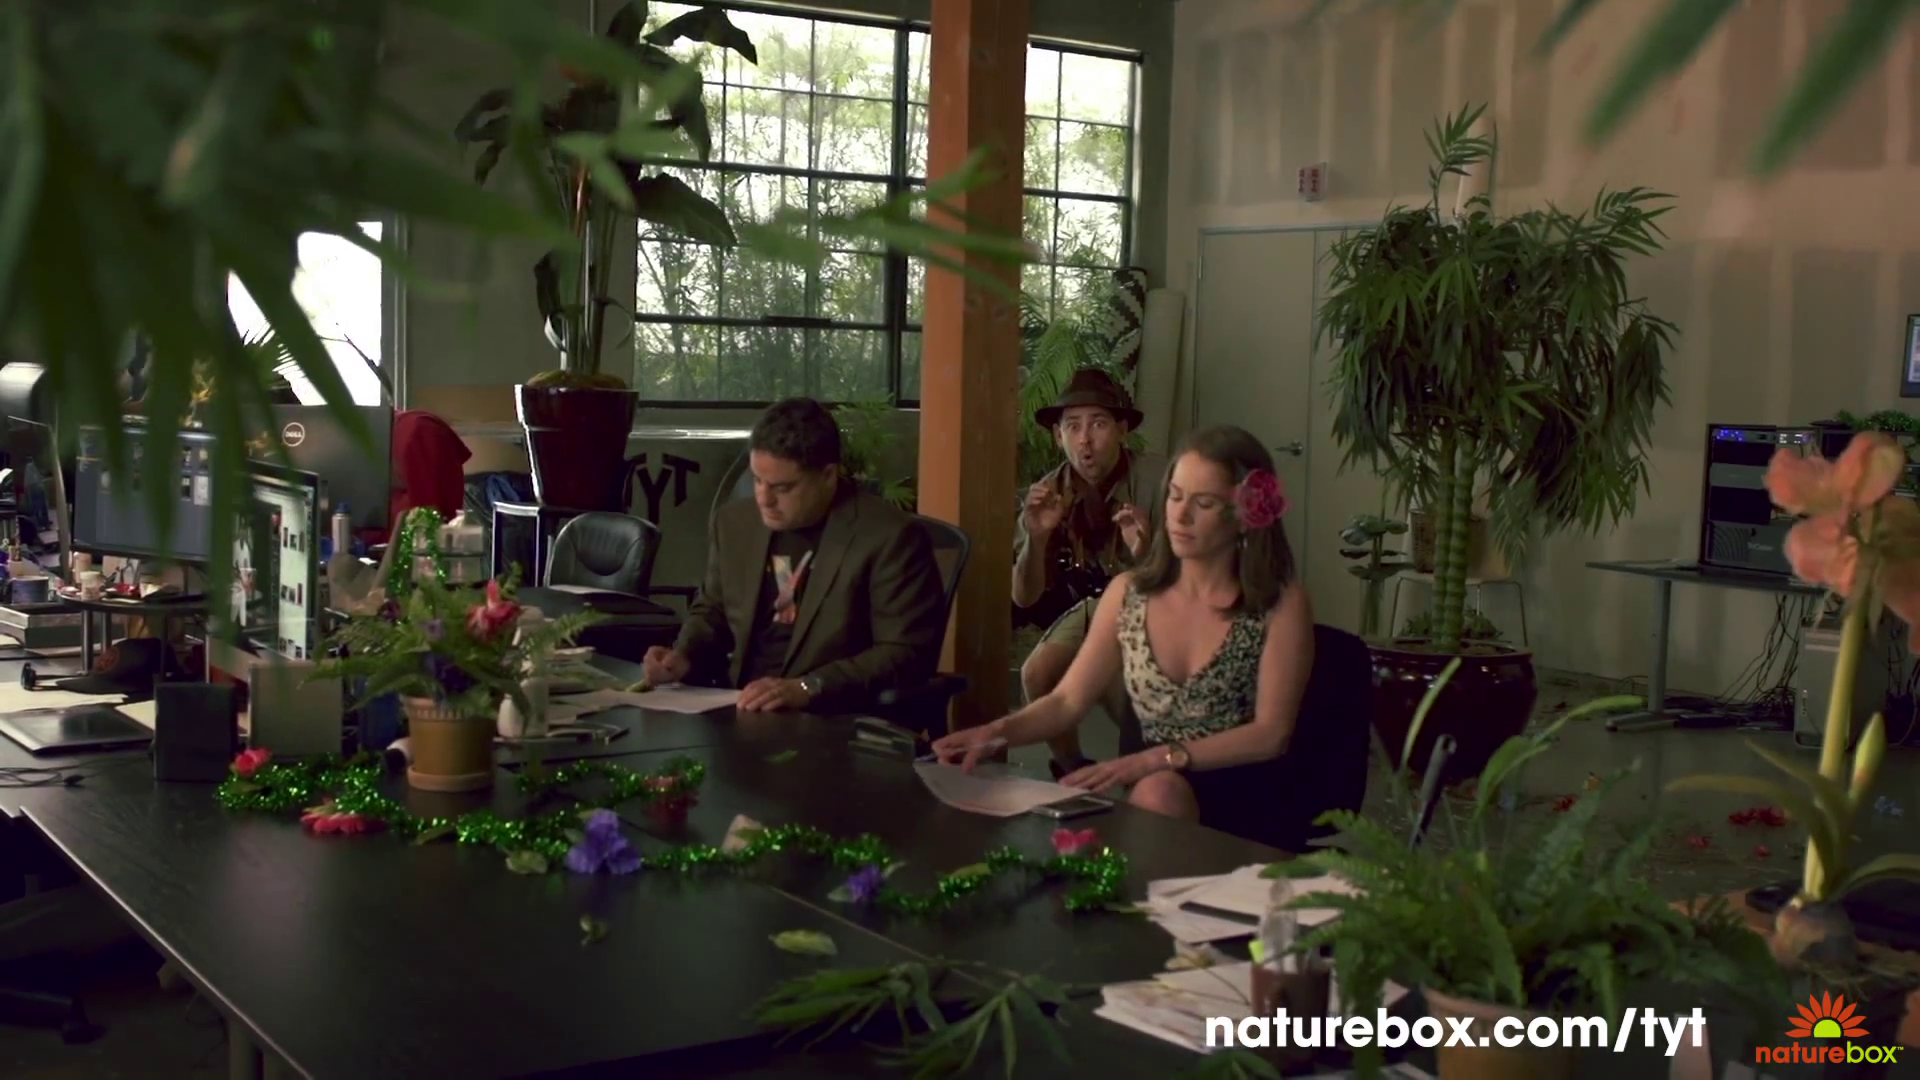 TYT Network Naturebox Campaign